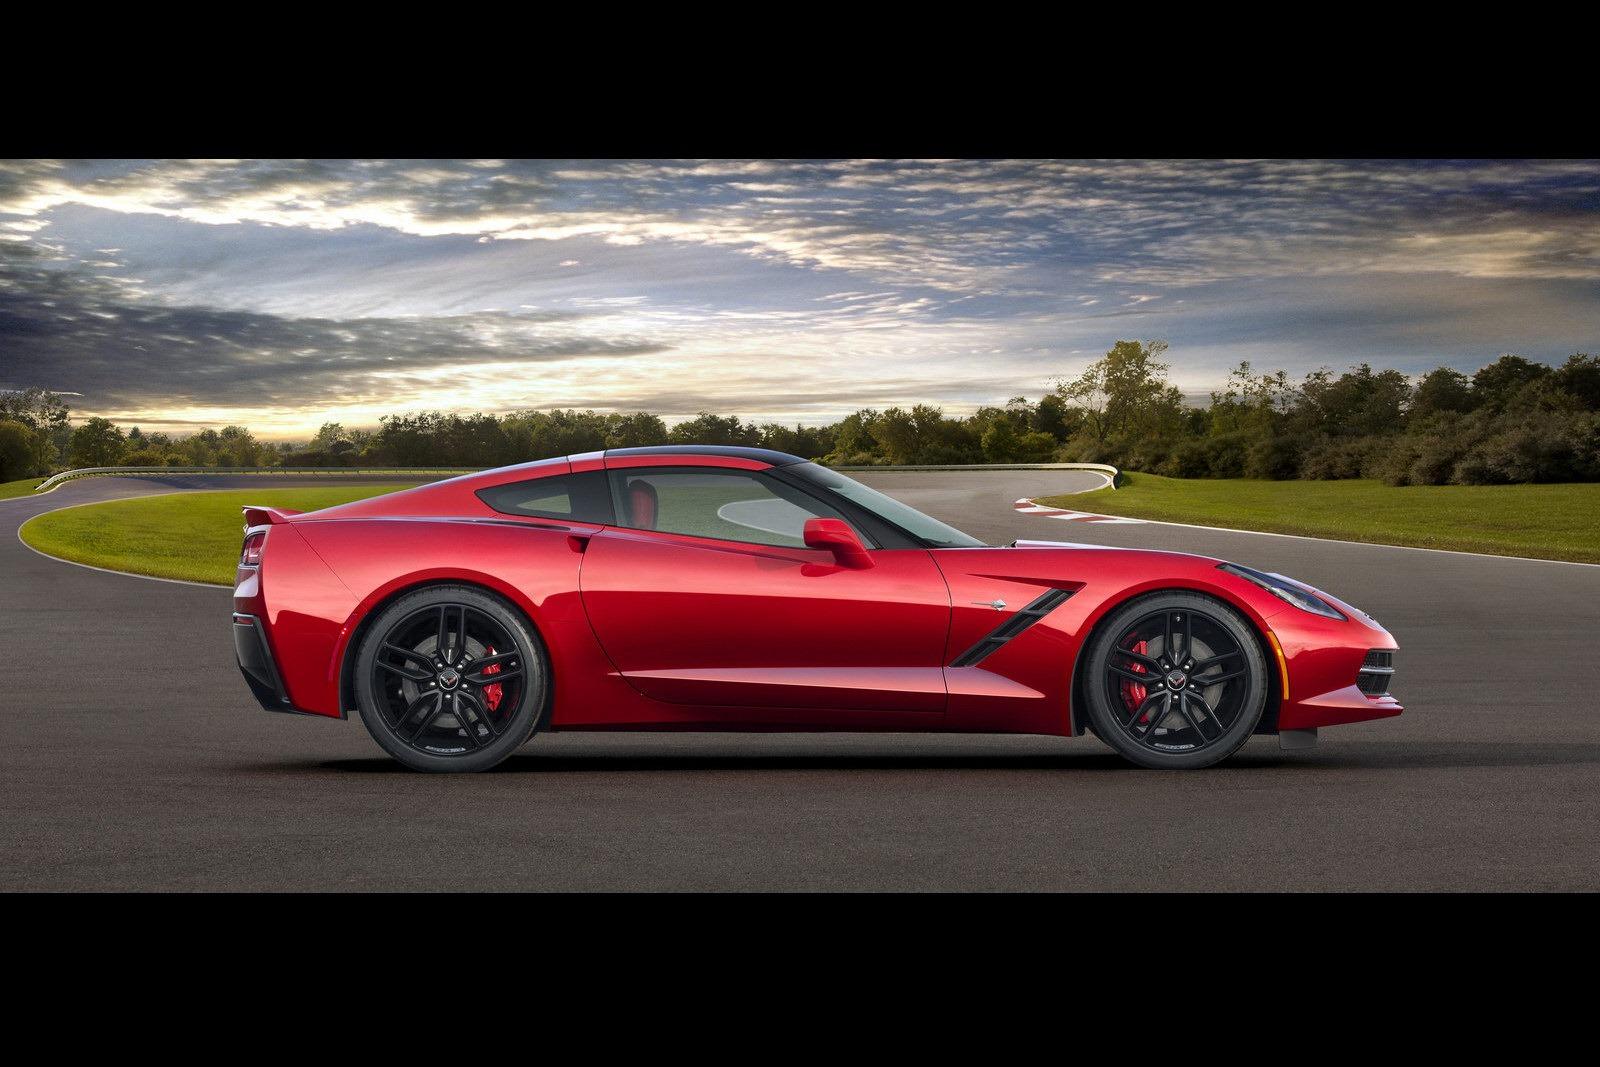 C7 corvette | Car Rolodex